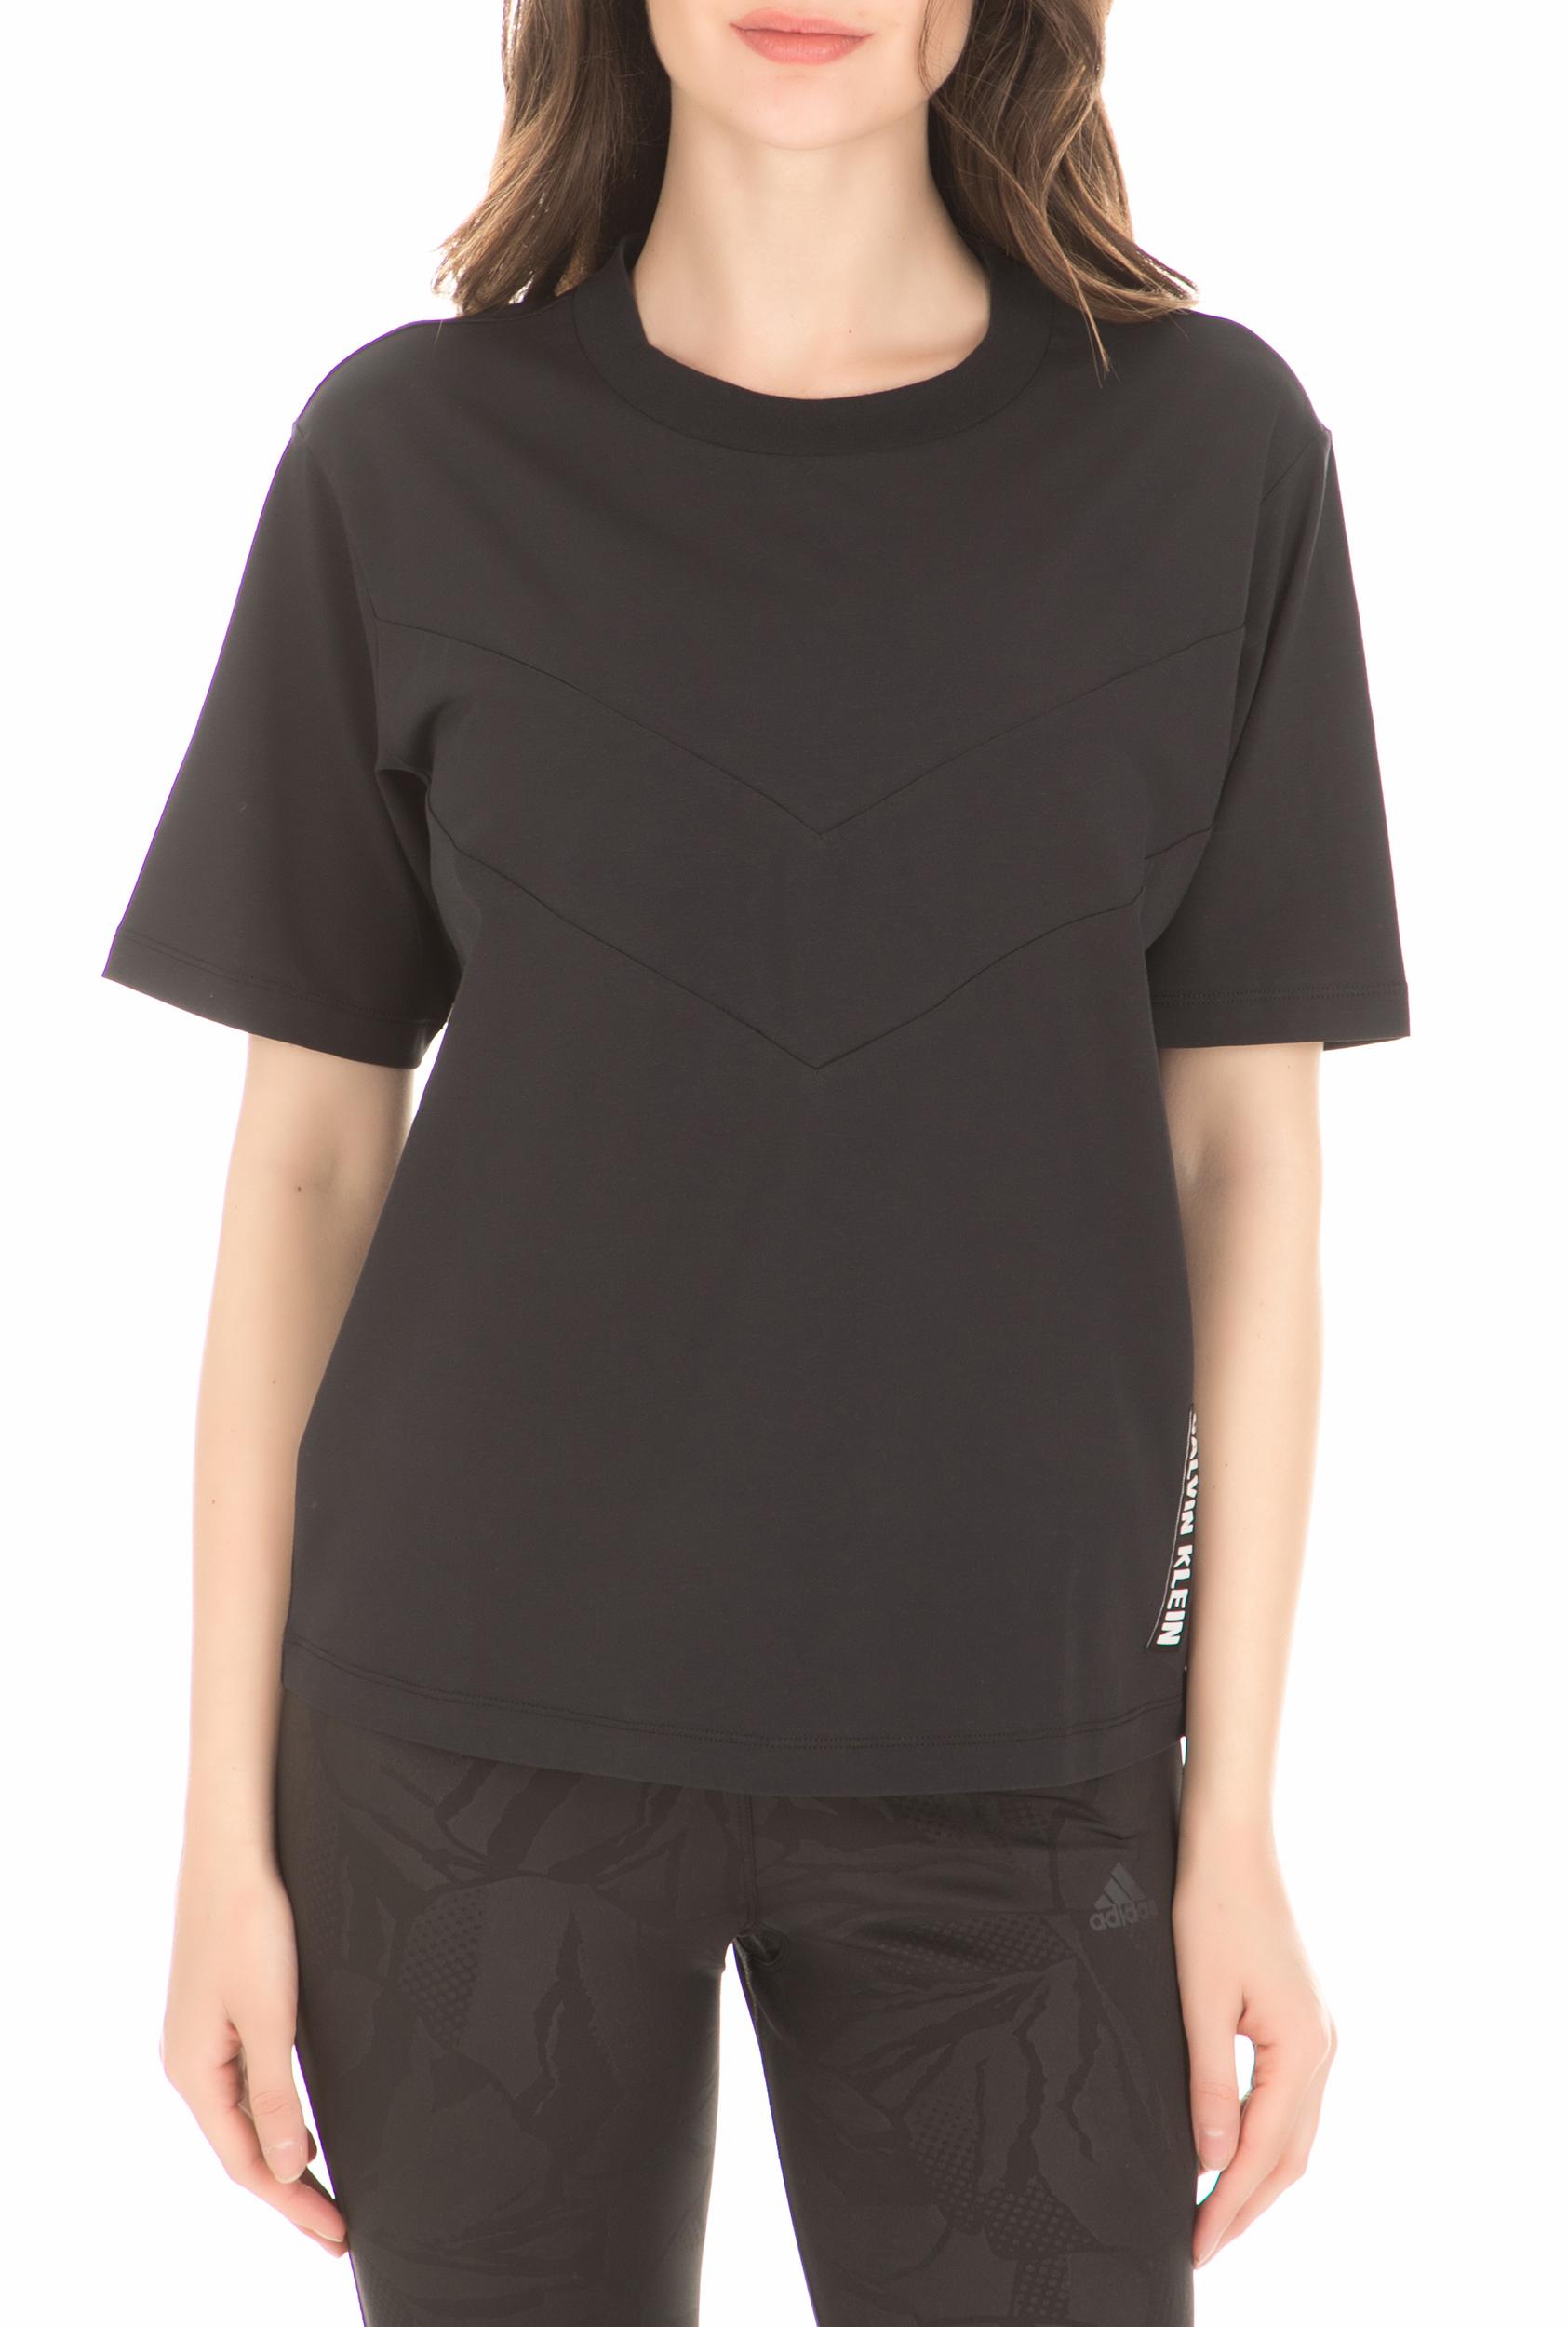 CK PERFORMANCE - Γυναικεία κοντομάνικη μπλούζα CK PERFORMANCE μαύρη